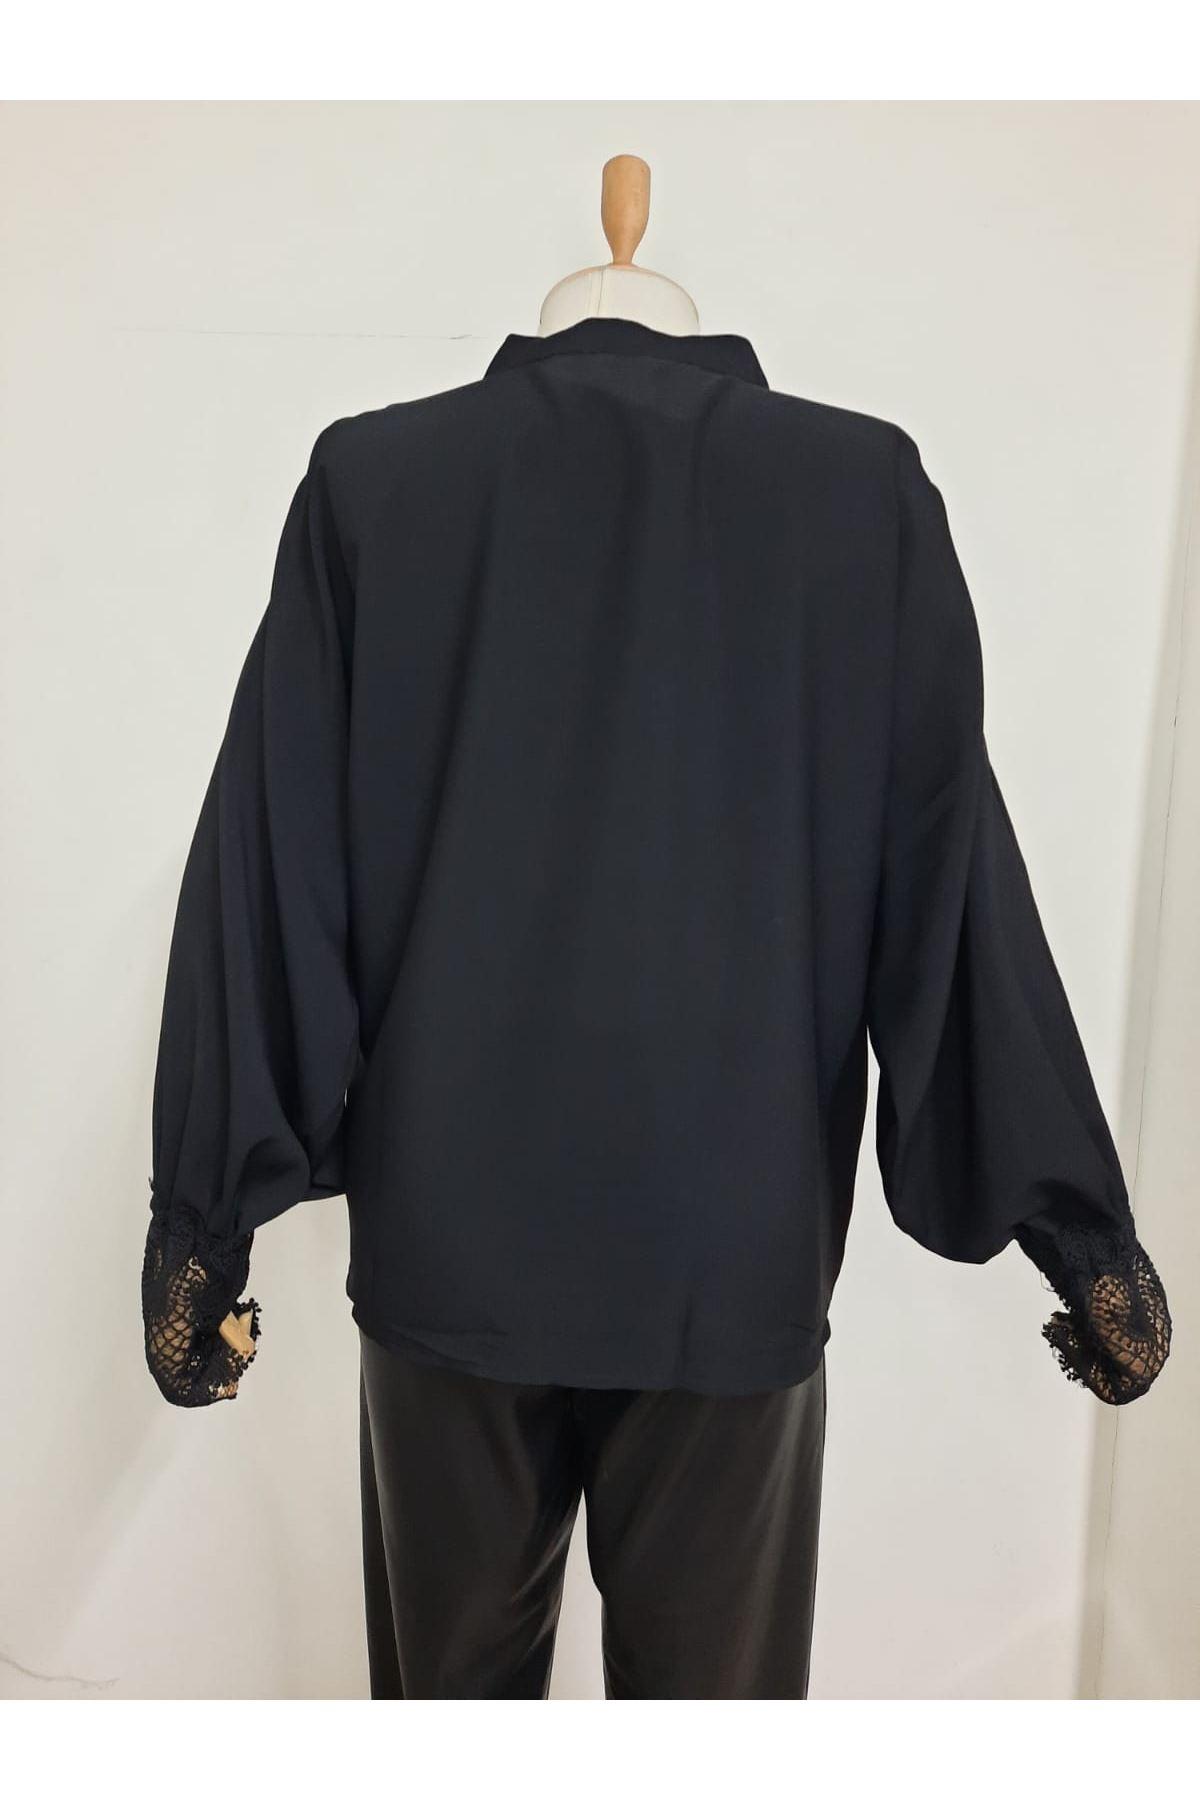 Dantel Detaylı Gömlek - SİYAH